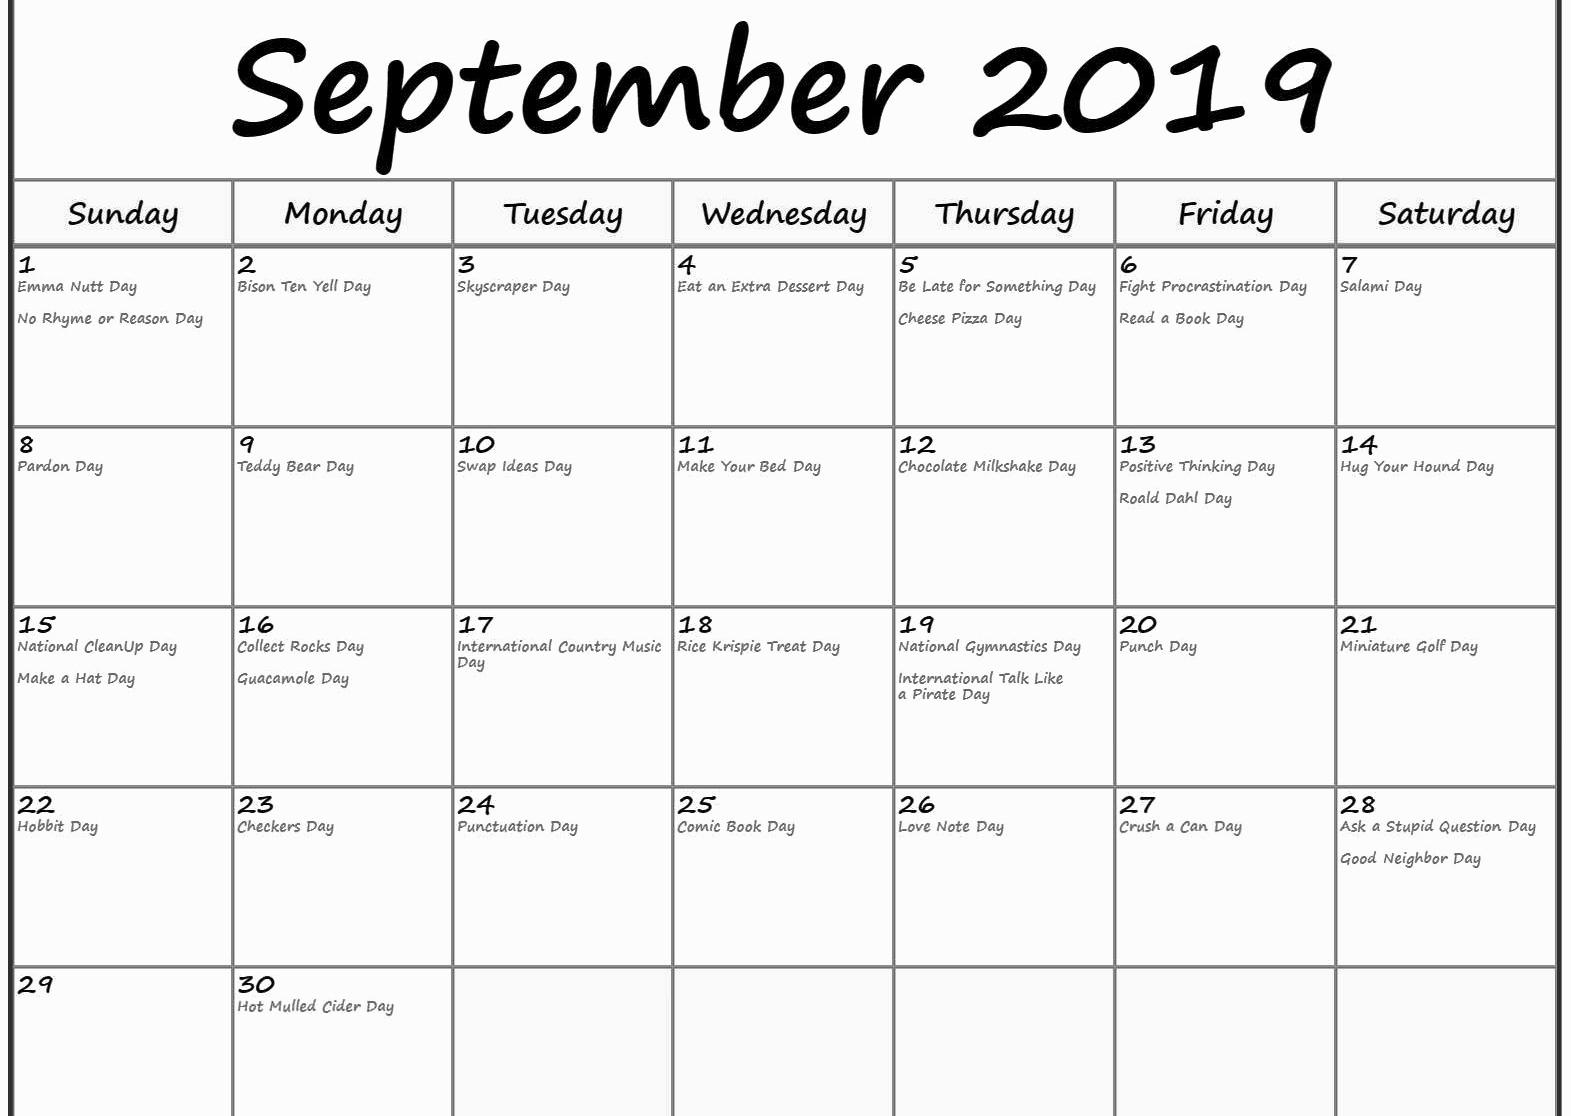 September 2019 Calendar Holidays